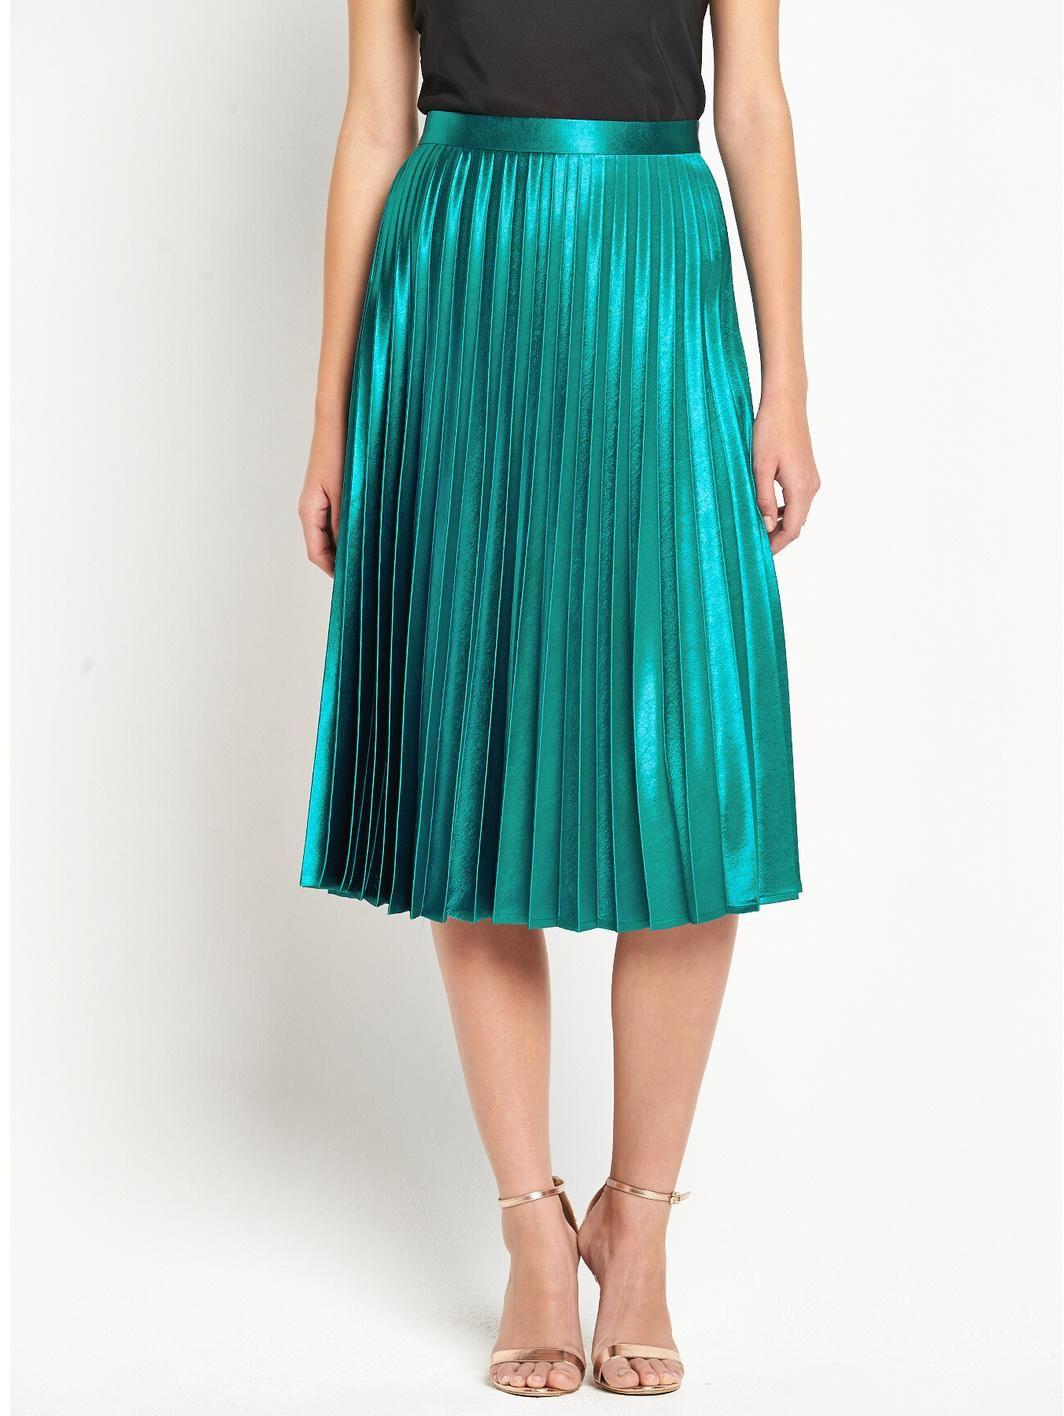 Sunray Pleated Midi Skirt, http://www.very.co.uk/definitions-sunray-pleated-midi-skirt/1458050171.prd